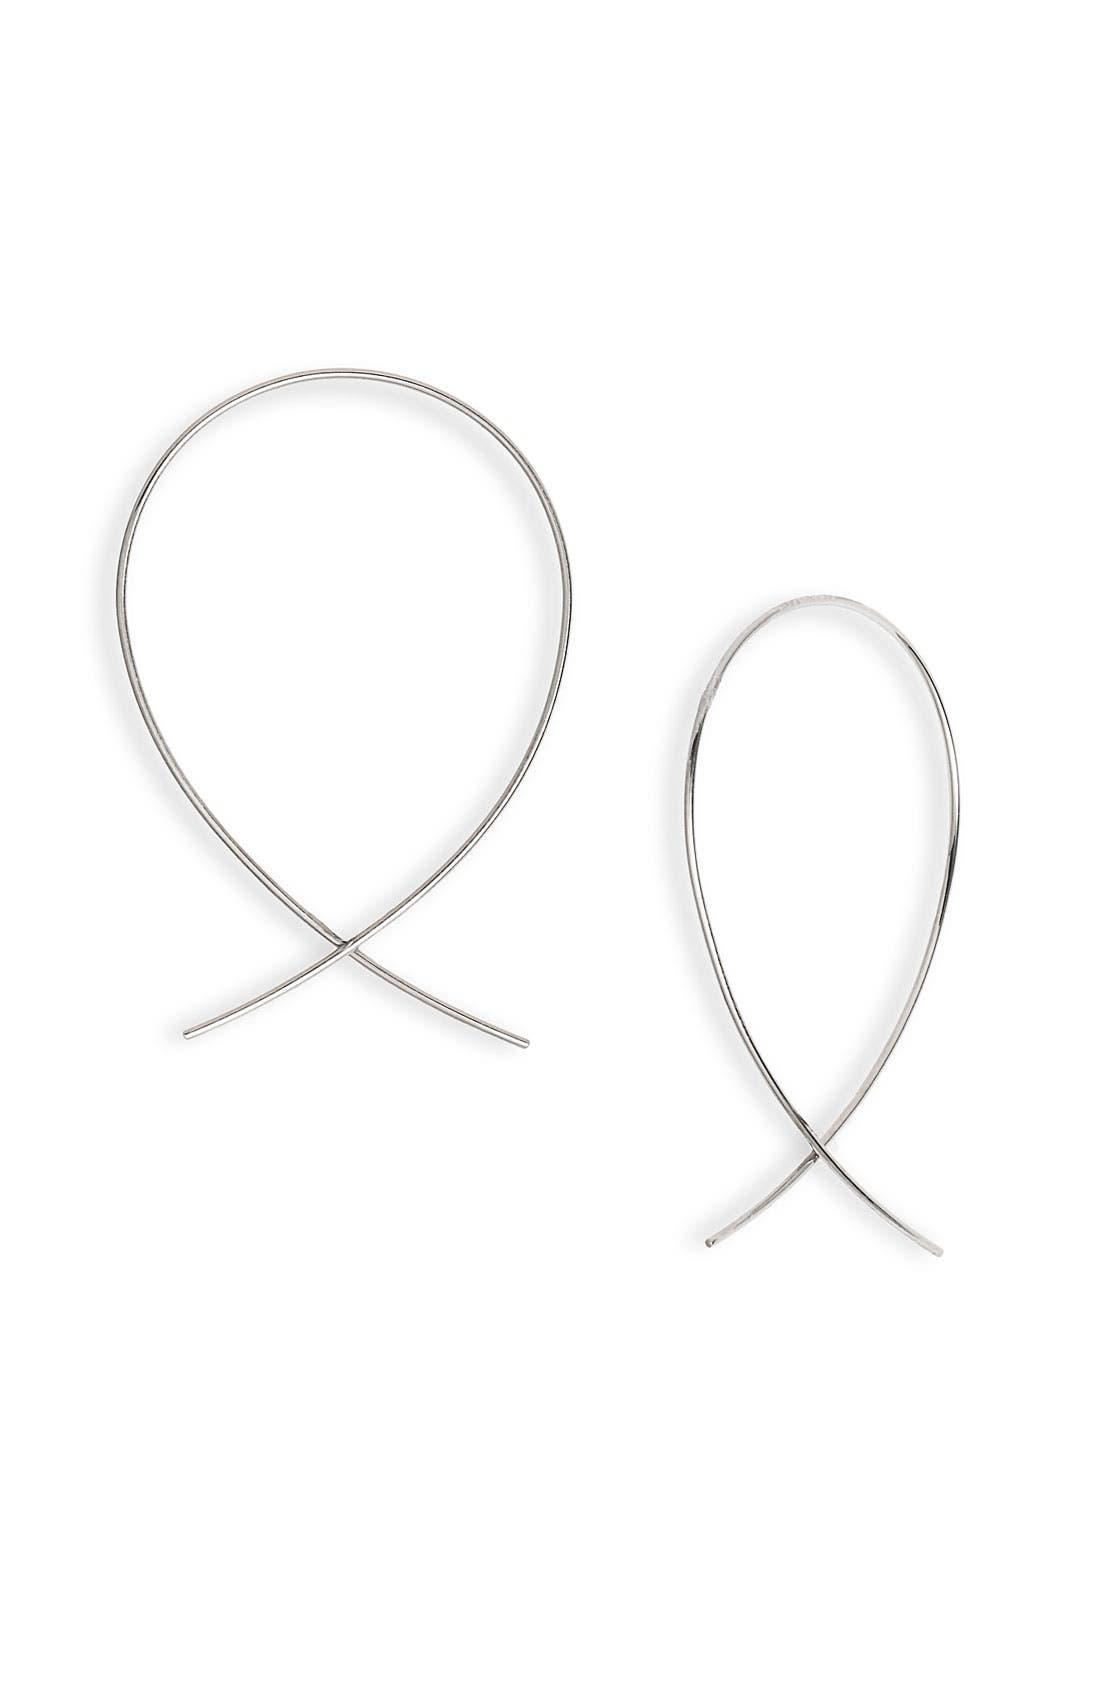 'Upside Down' Small Hoop Earrings,                             Main thumbnail 1, color,                             WHITE GOLD